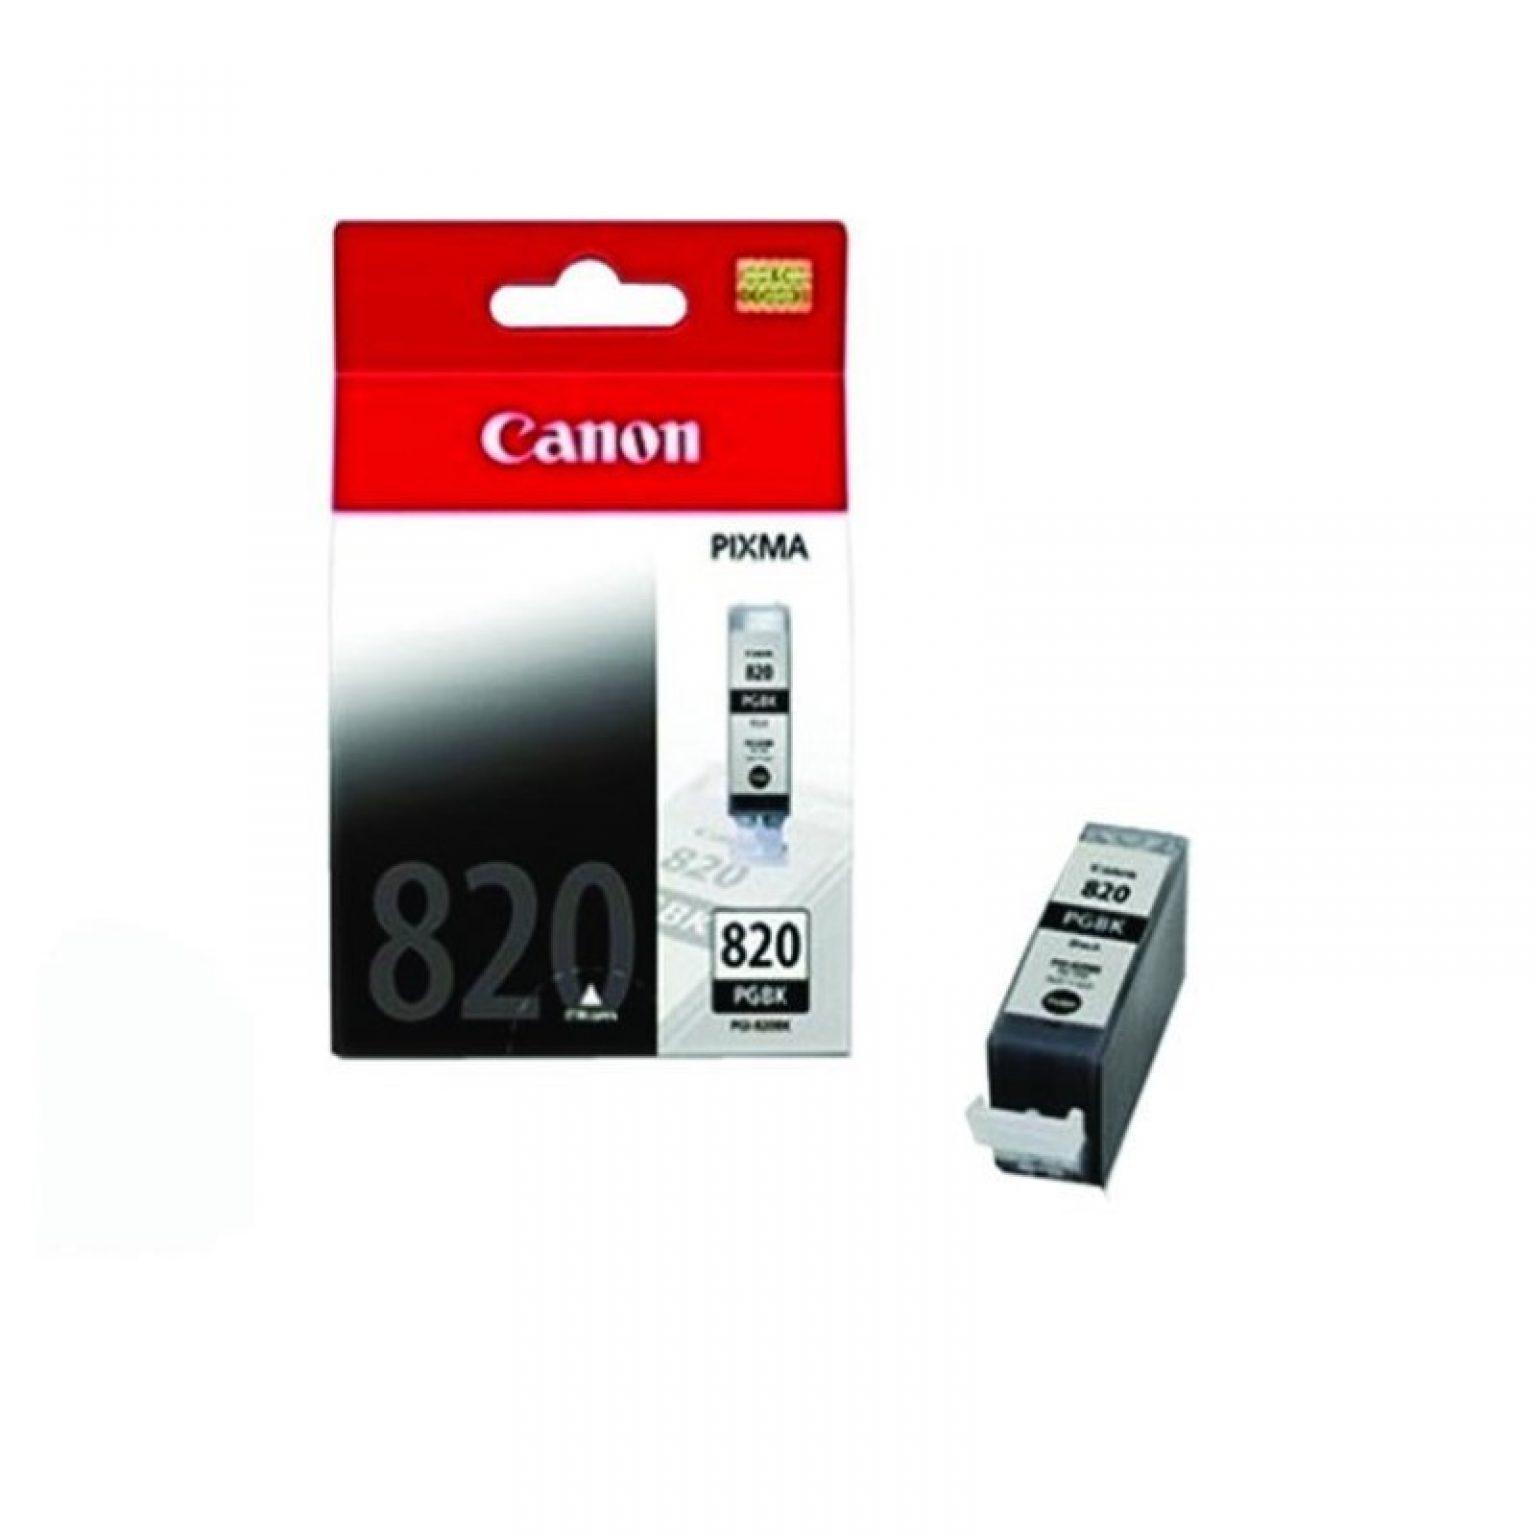 CANON - Ink Cartridge PGI-820 Black [PGI820]